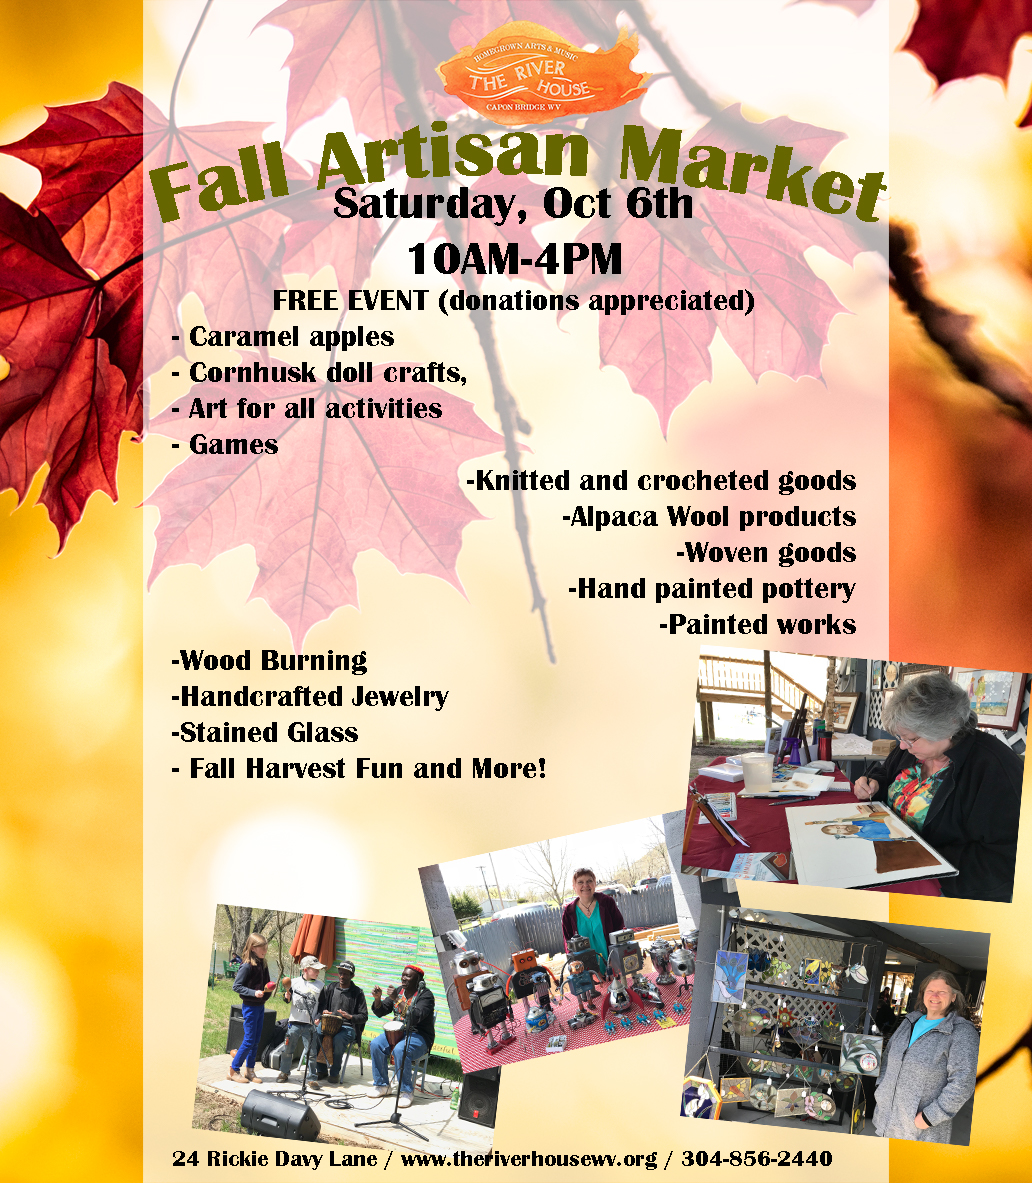 Fall Artisan Market Flyer 2.jpg